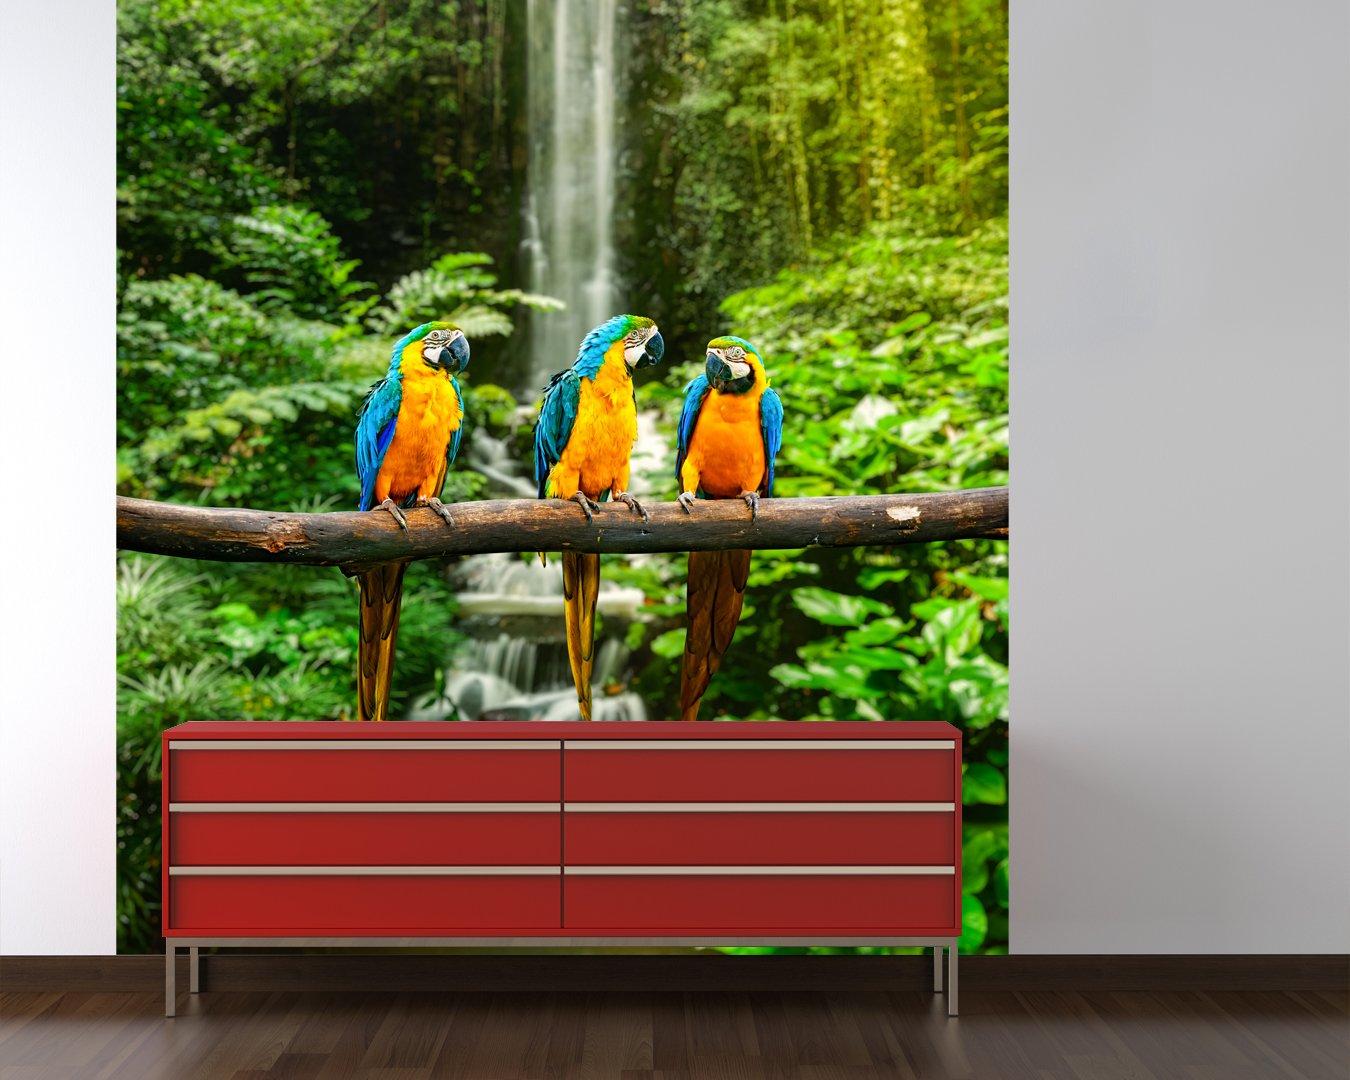 Selbstklebende Fototapete - Blau-Gelber Macaw Papagei - 178x200 cm - - - Wandtapete – Poster – Dekoration – Wandbild – Wandposter - Bild – Wandbilder - Wanddeko b18970